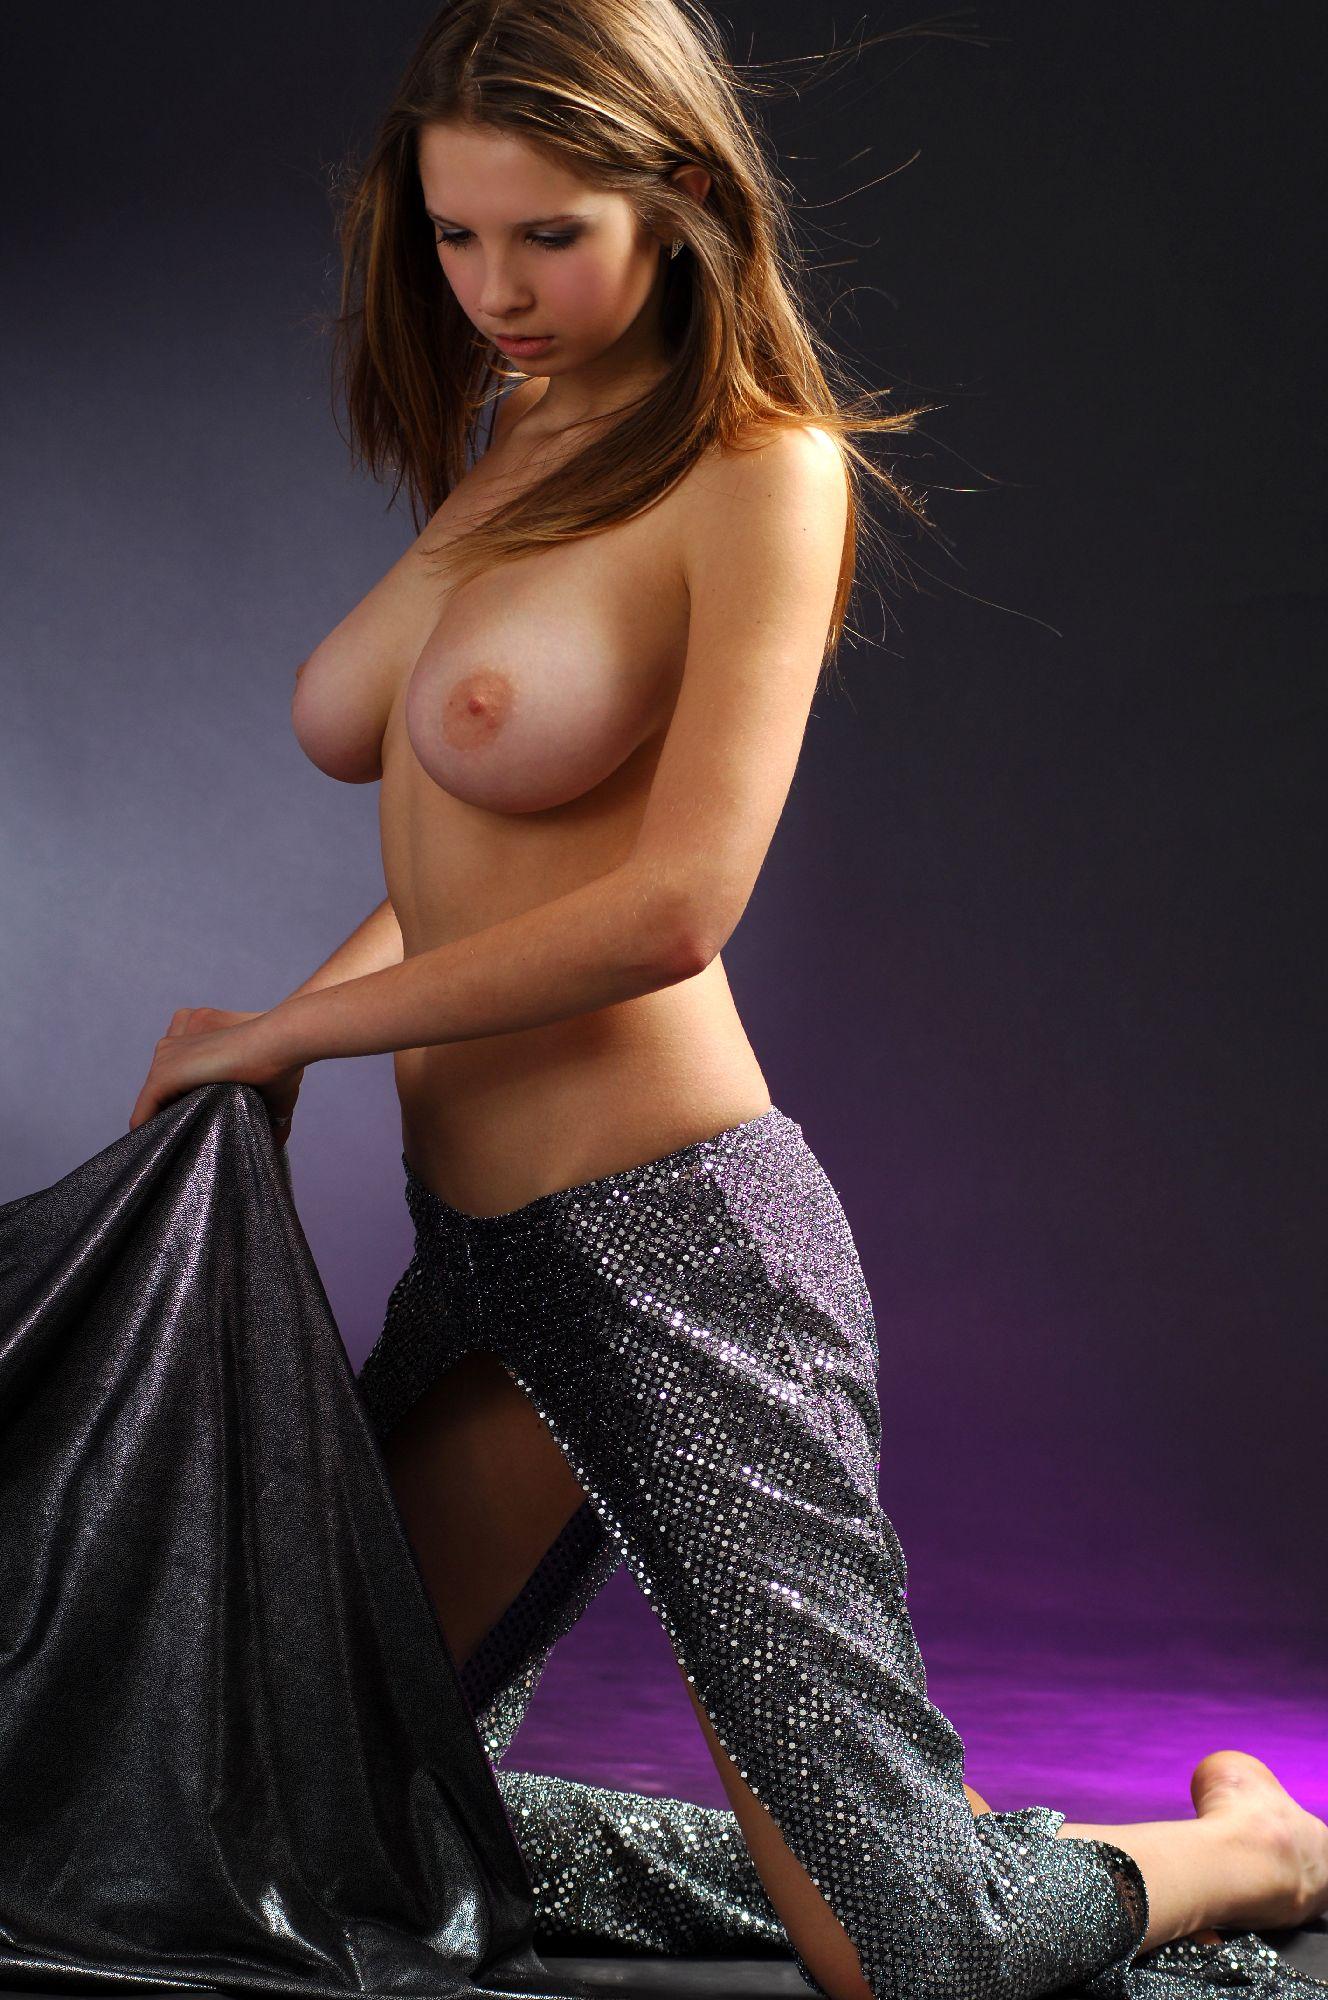 Art Modeling Studio Models Posing Nude My Hotz Pic | CLOUDY ...